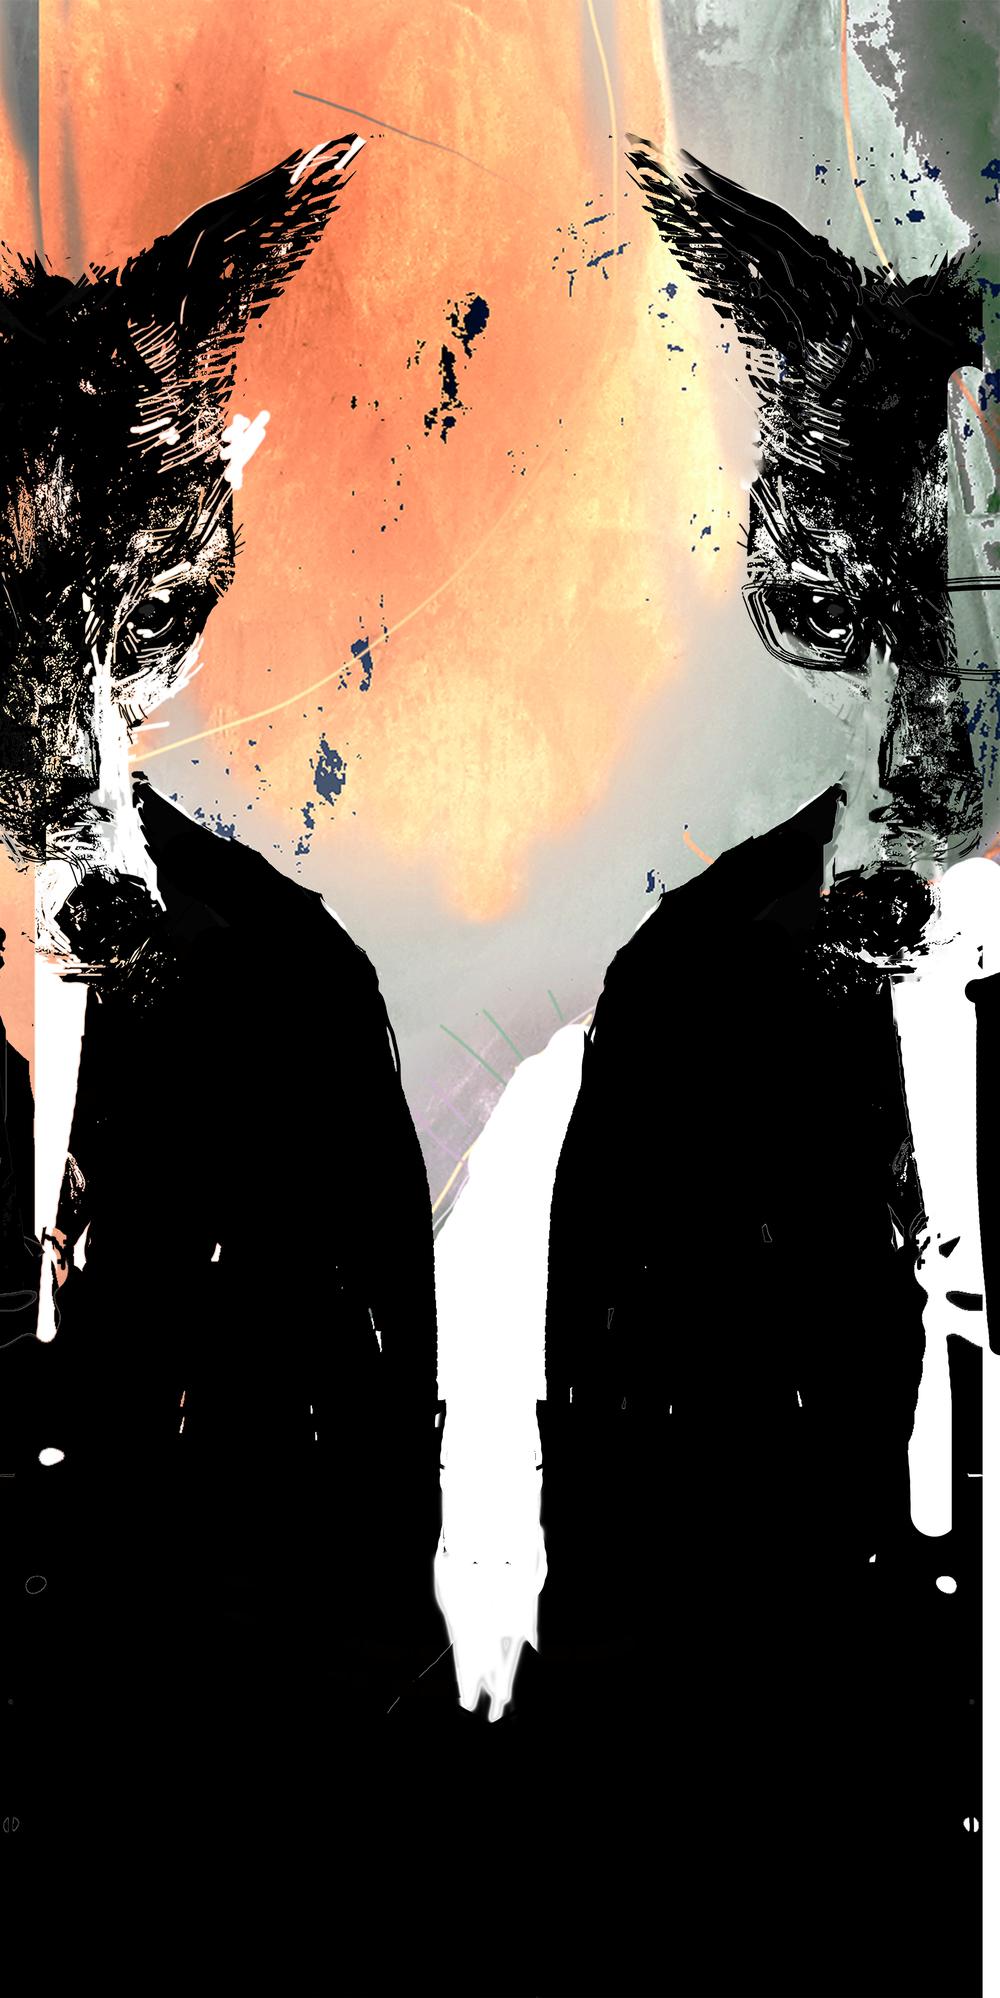 Harry Bunce - Kray Twins (am)